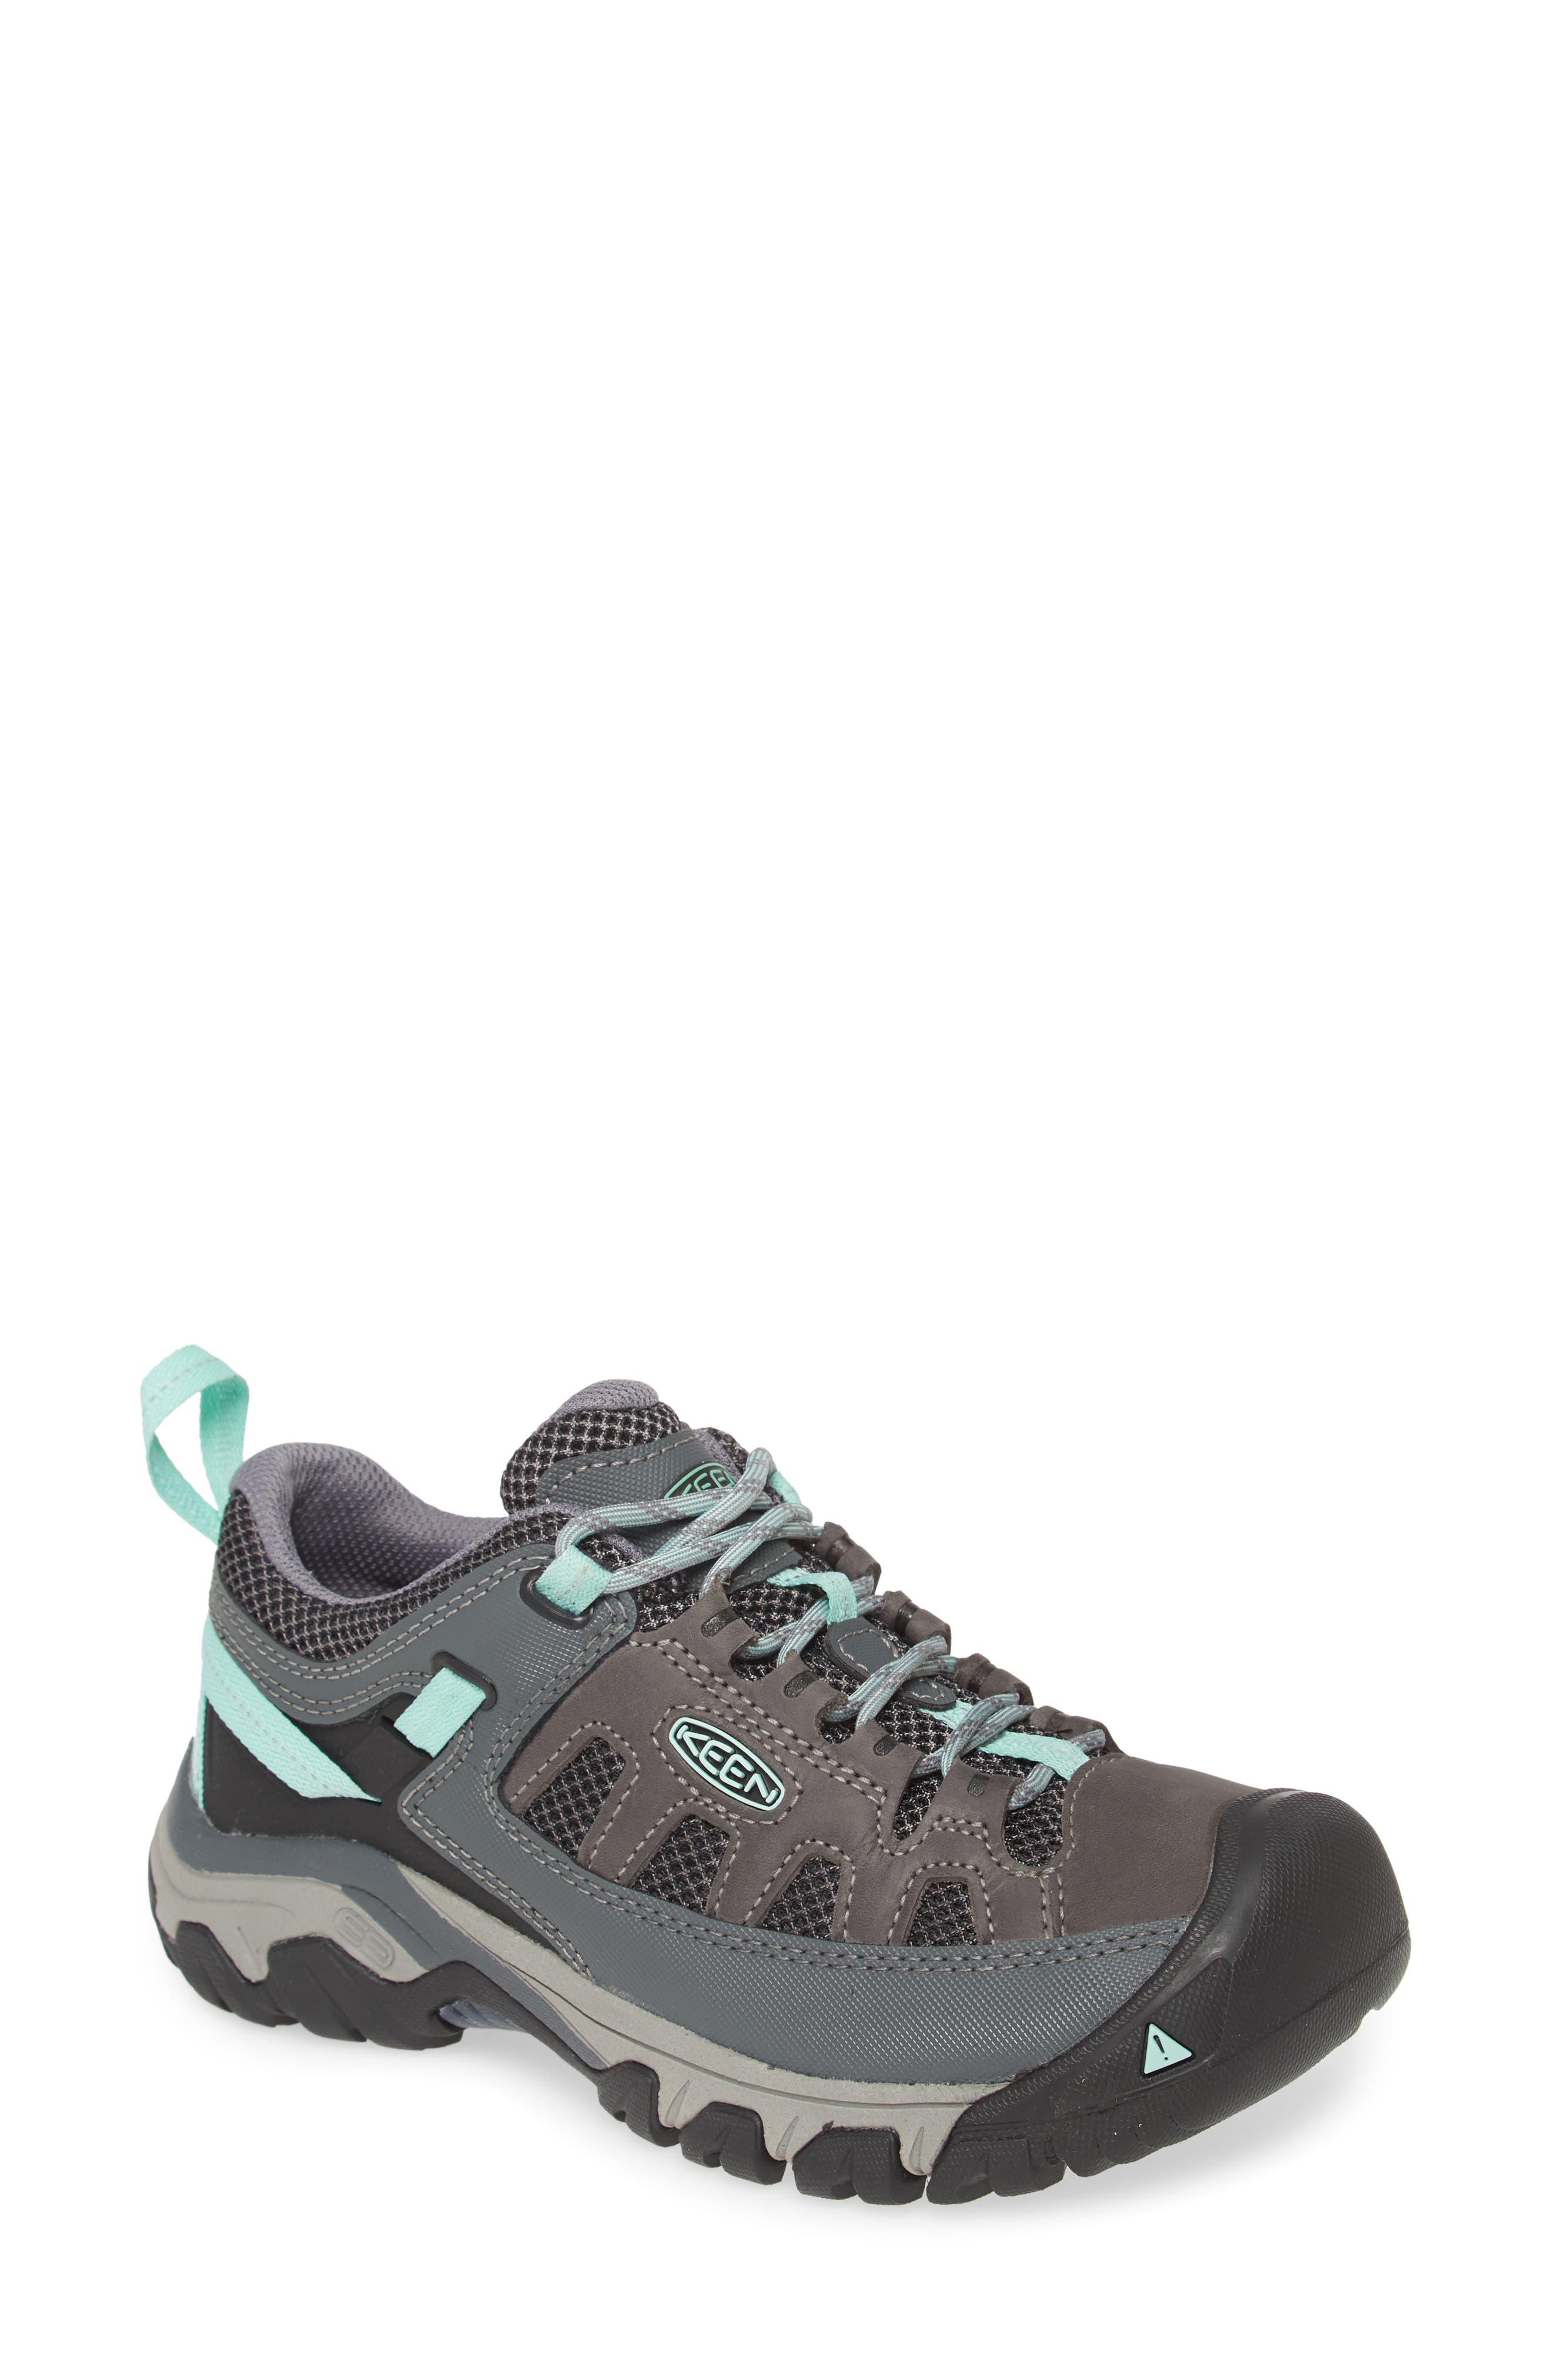 Targhee Vent Hiking Shoe